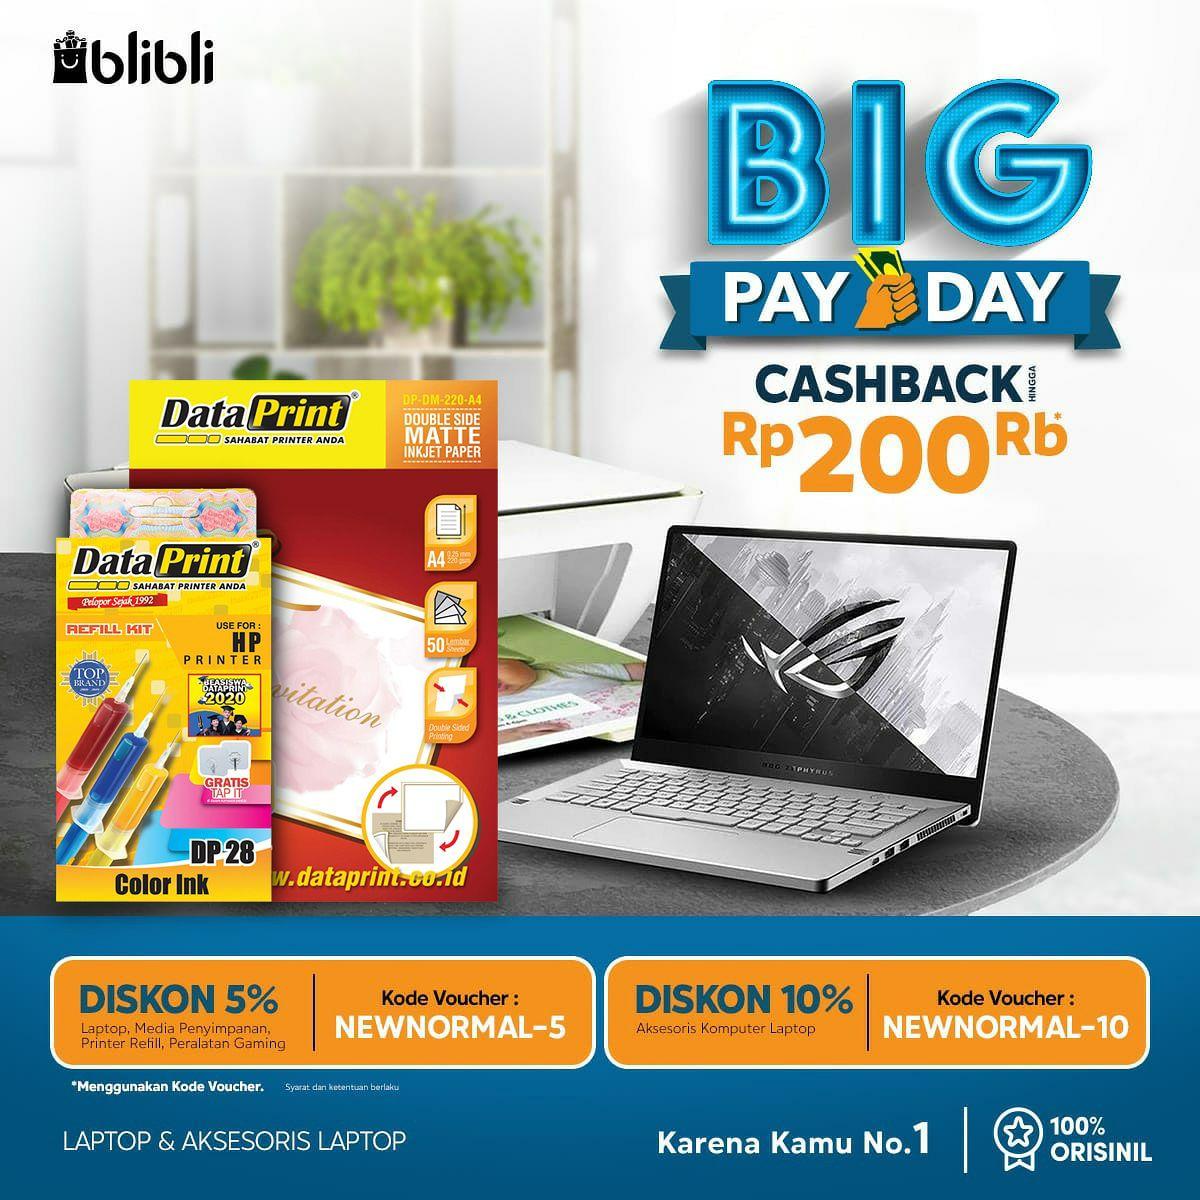 Promo Cashback Big Payday DataPrint di Blibli  Dapatkan cashback untuk pembelian produk DataPrint yang mana saja hanya di official store DataPrint Blibli : https://t.co/kIxuwLSDUi  Promo berlaku HANYA hari ini tanggal 27 juni 2020  Jangan sampai kehabisan, kupon terbatas. https://t.co/I9W517OcZU